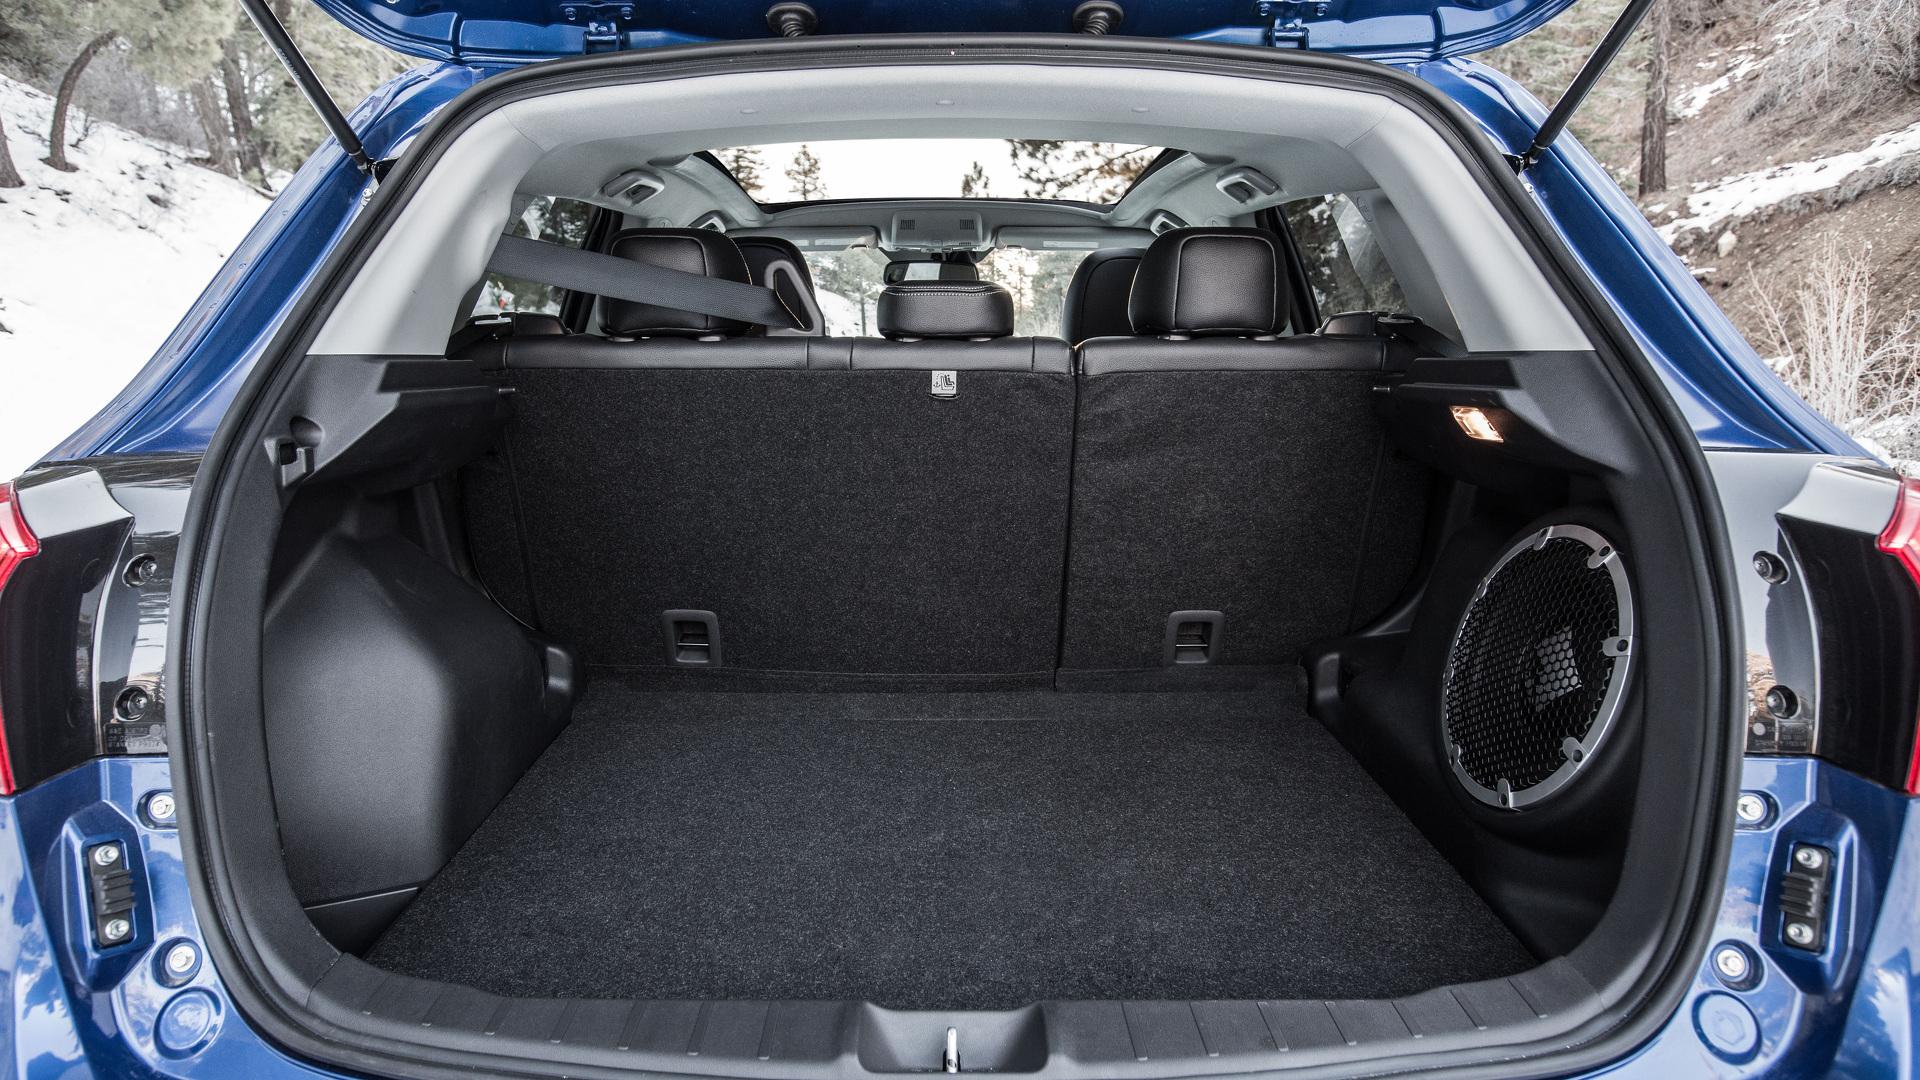 2015 Mitsubishi Outlander Sport recalled for potential fire risk